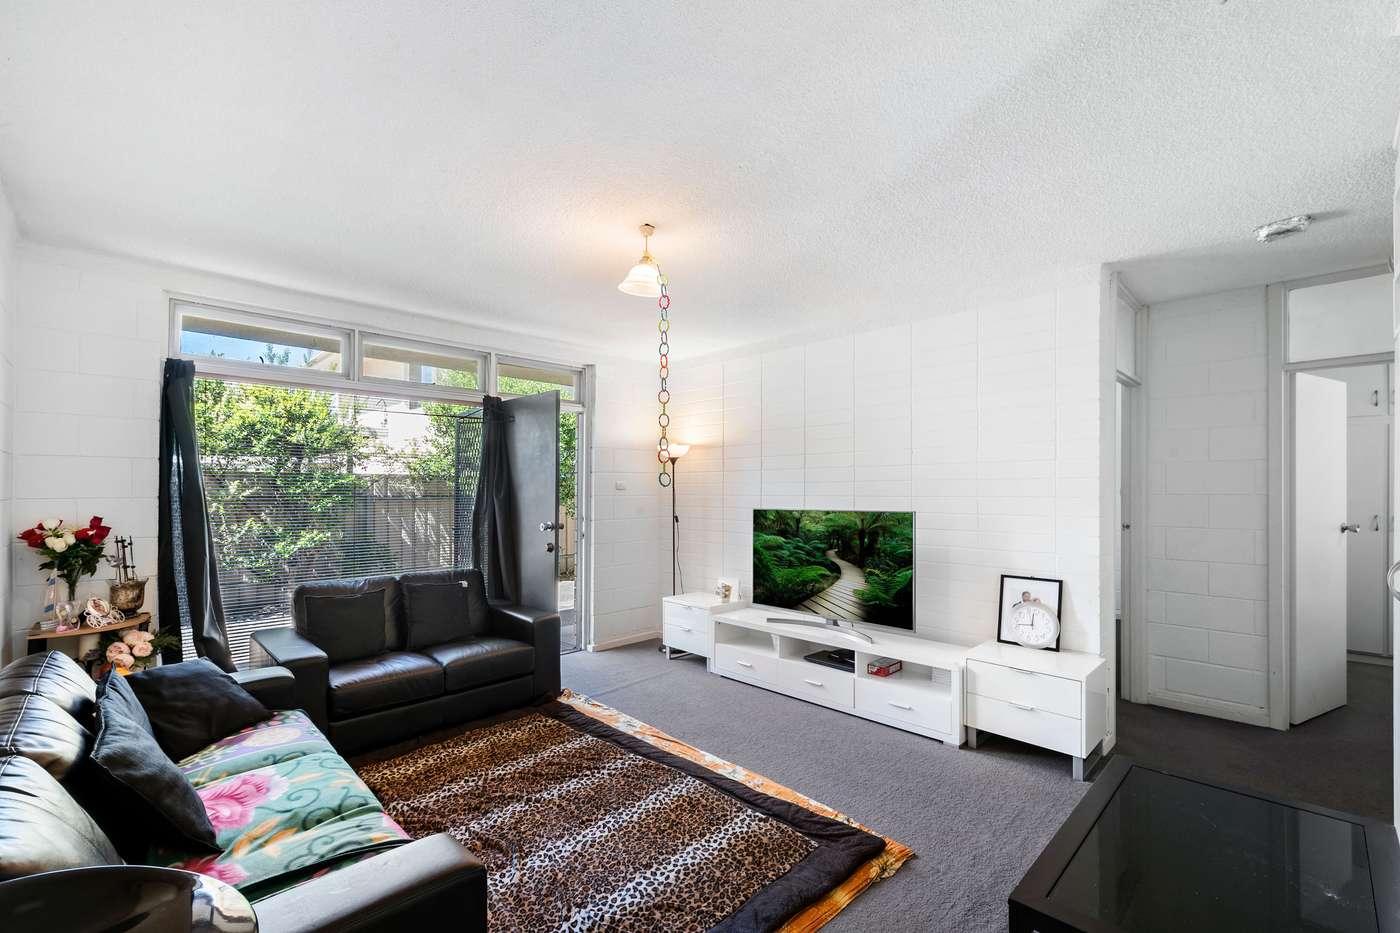 Main view of Homely unit listing, 2/9 Henry Street, Plympton, SA 5038